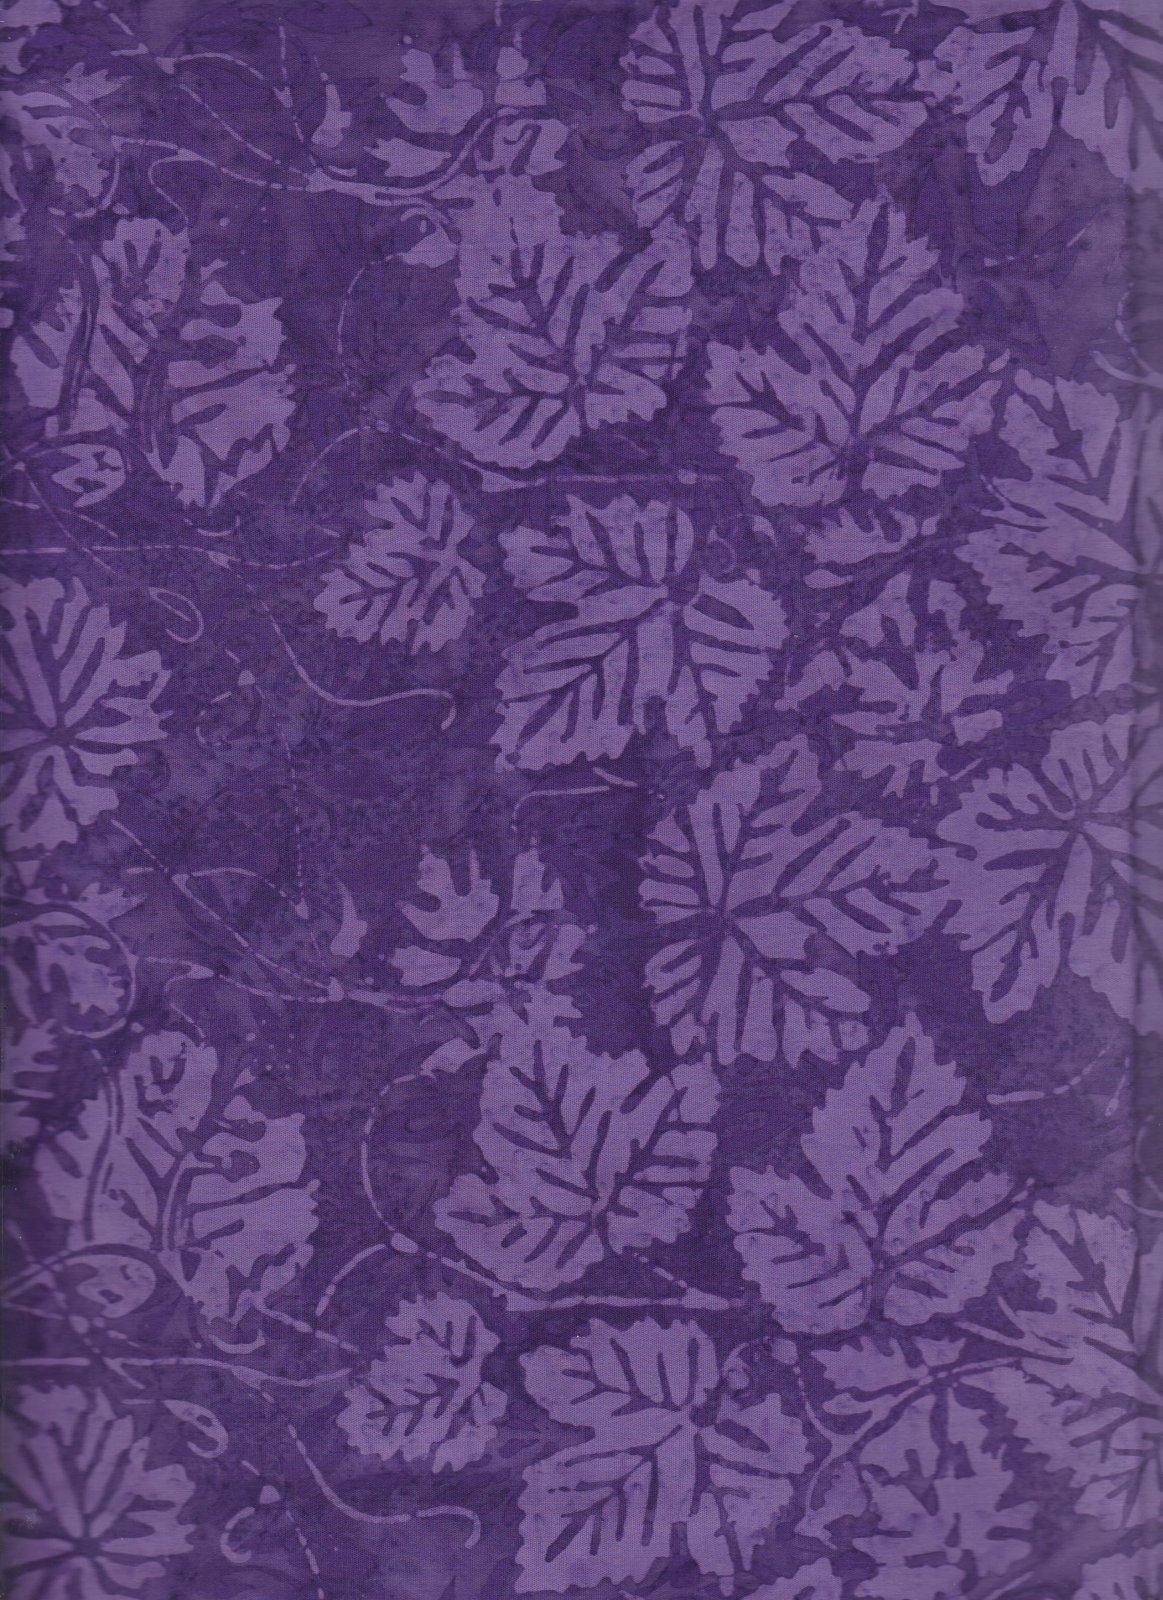 Island Batik 14T-P2 Purple